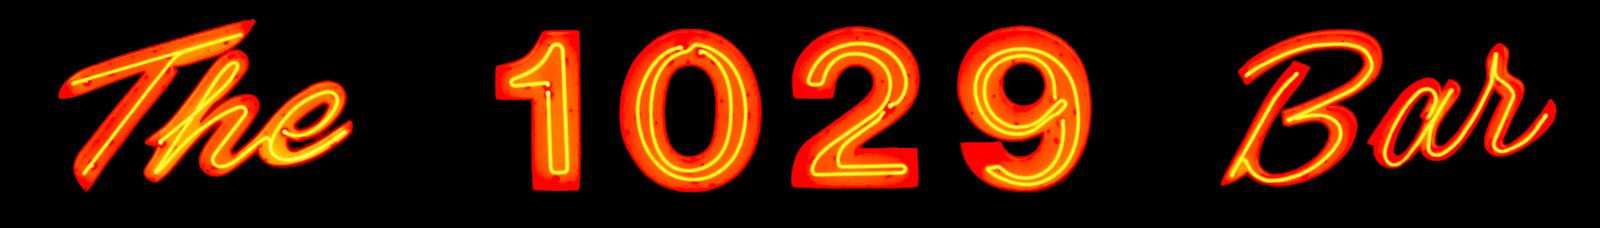 1029 Logo